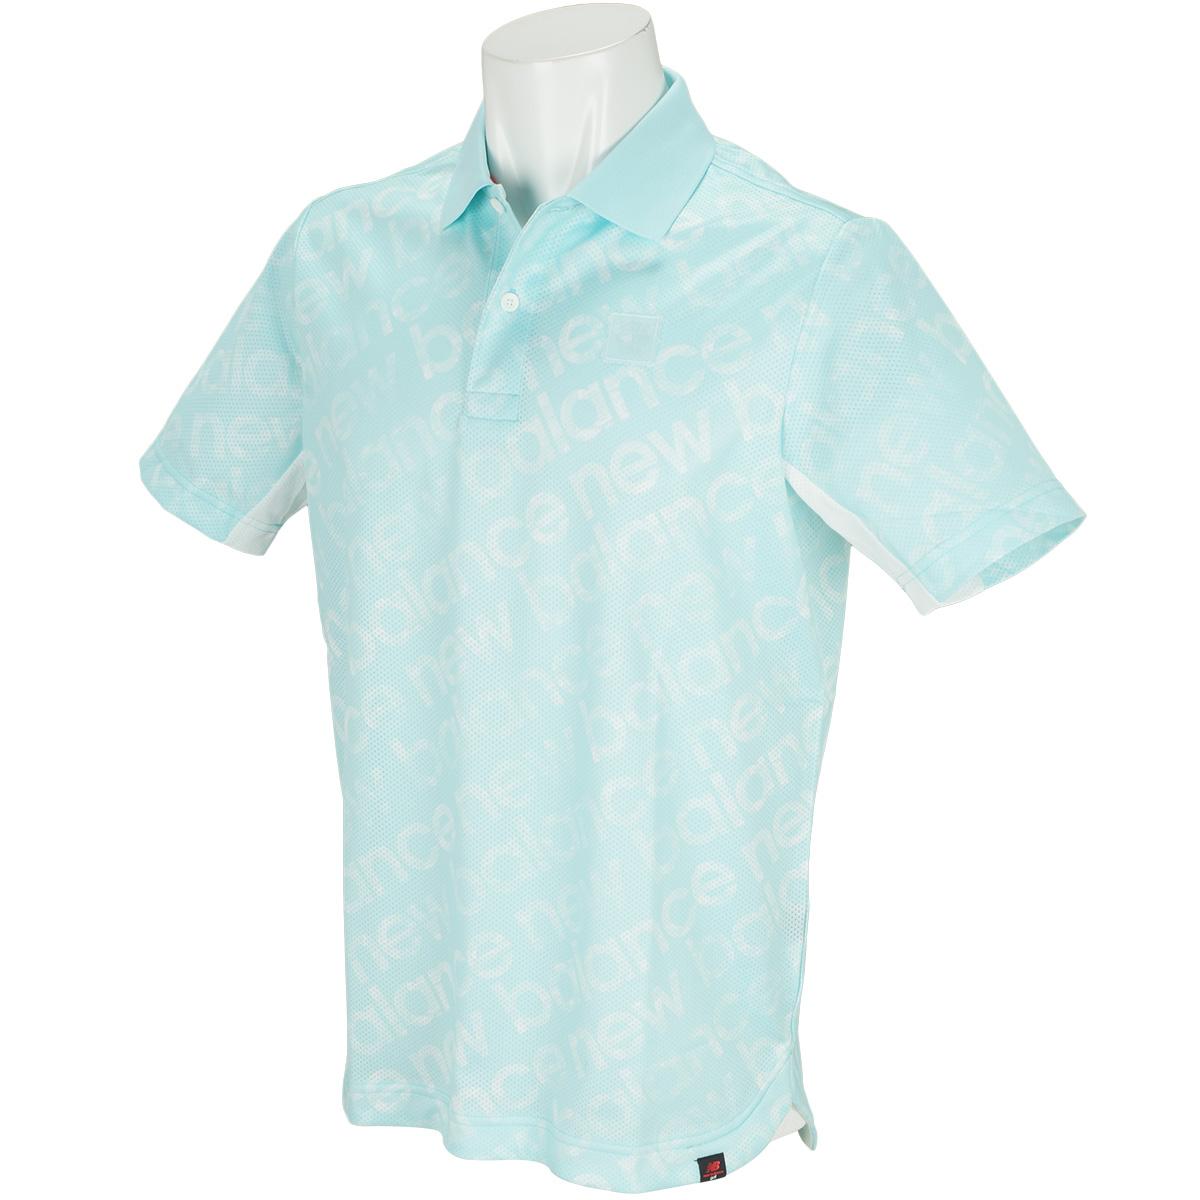 SPORT 半袖ポロシャツ